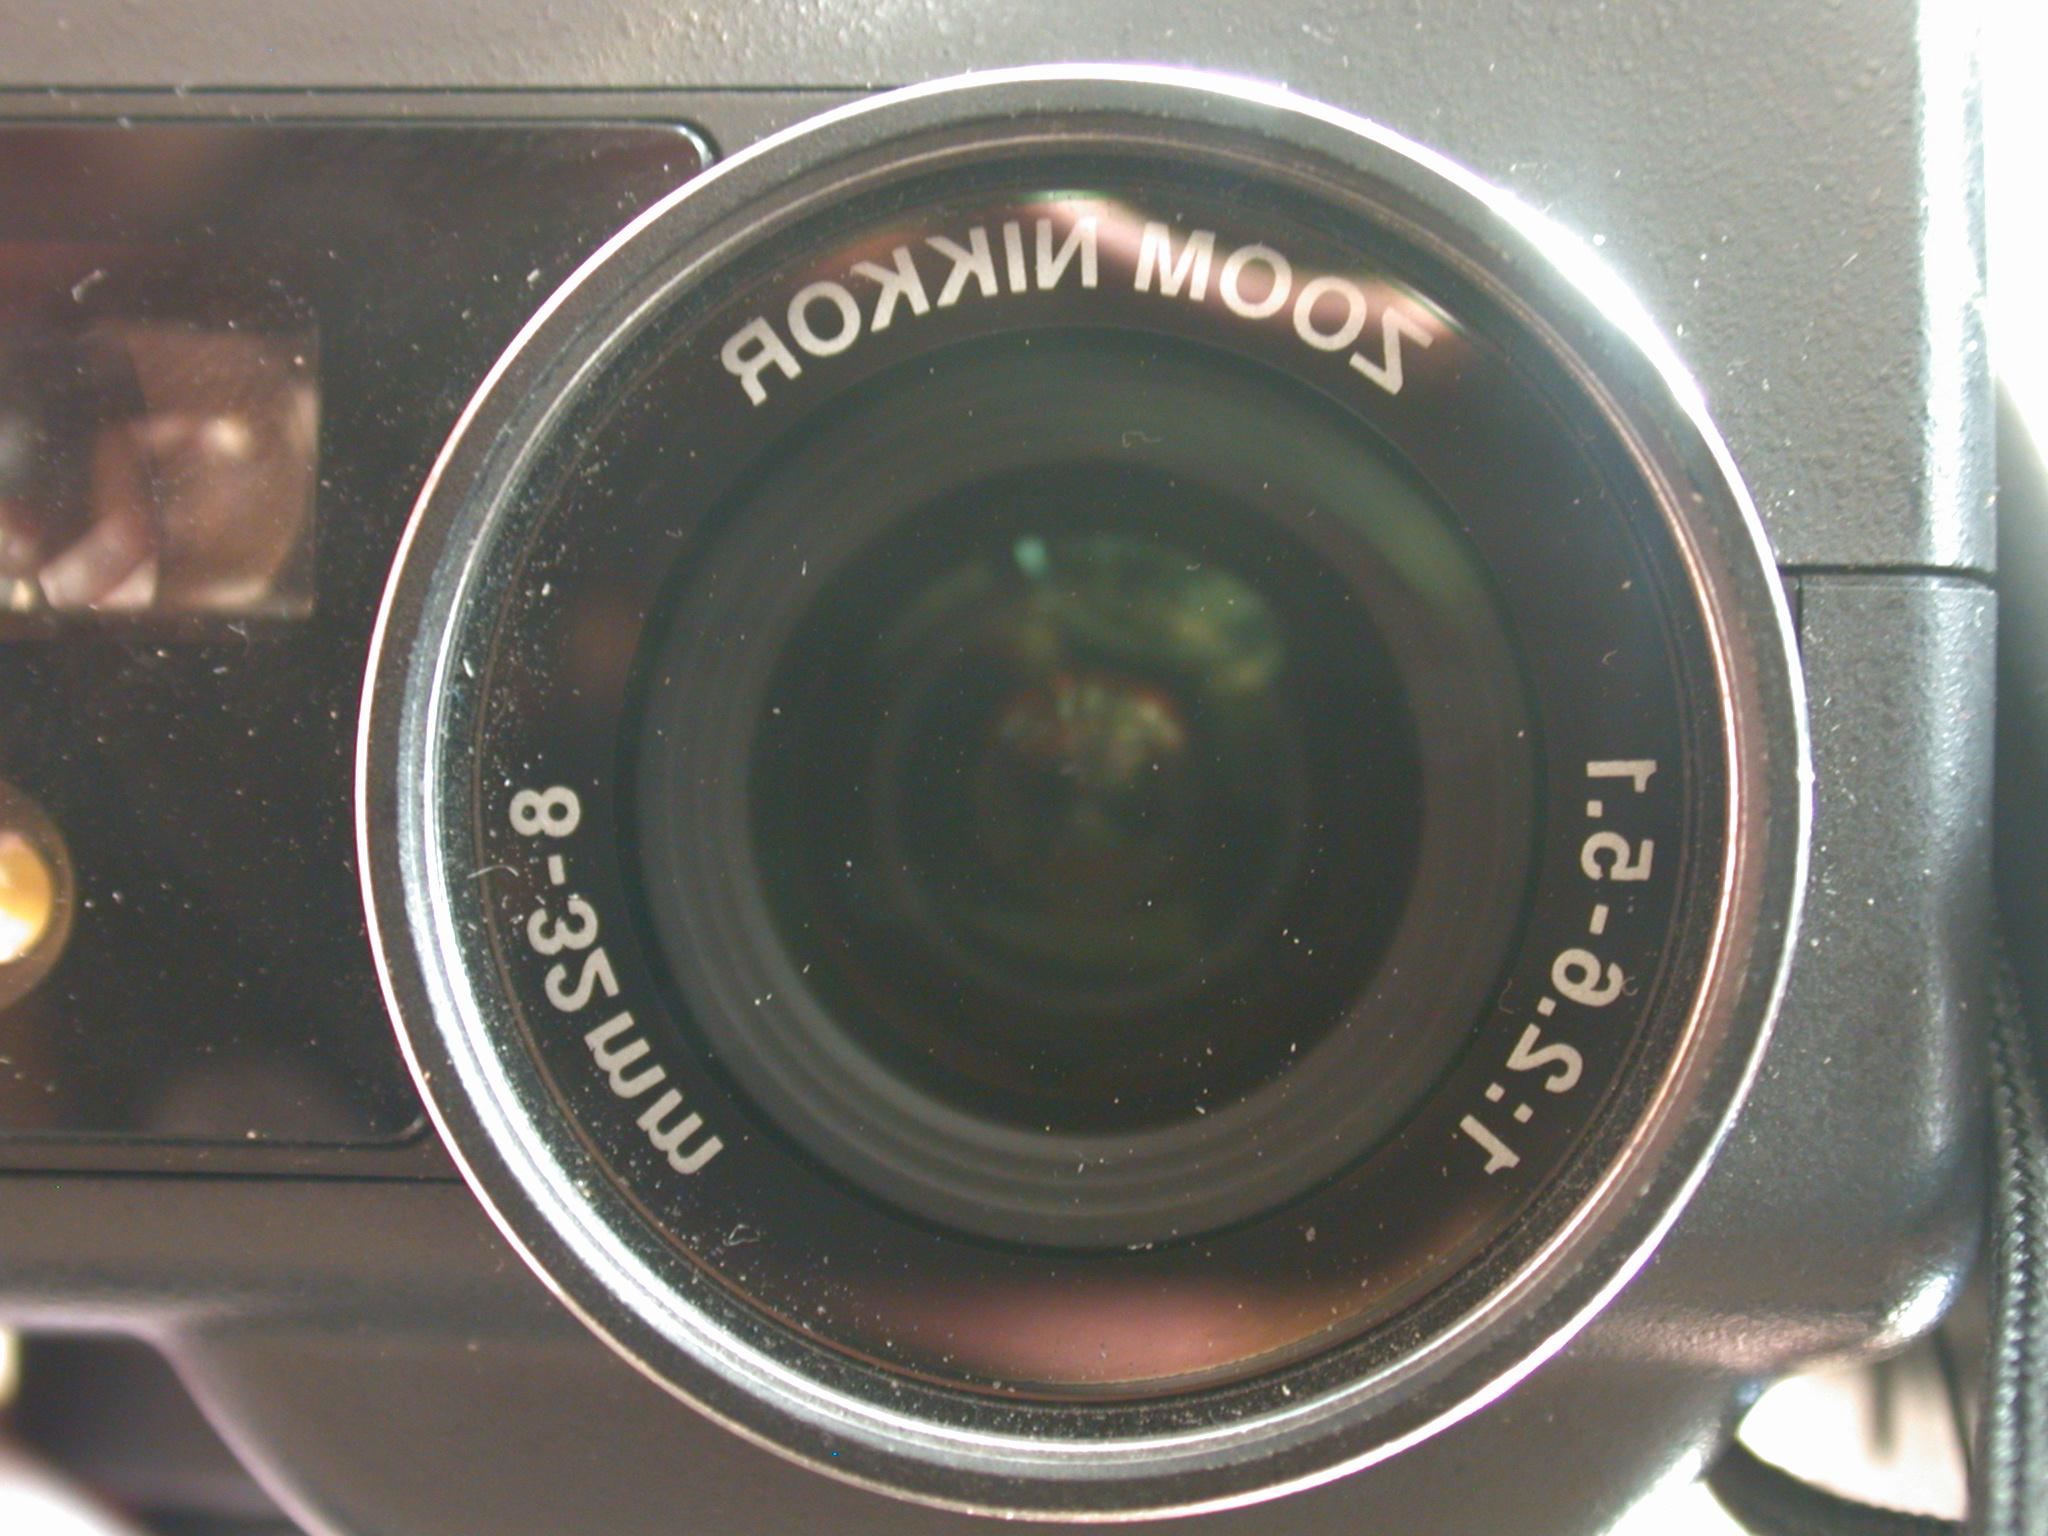 nikkon nikkor old camera zoom lens optic optical round shiny glossy mm 35-8 8 35 milimeter flash